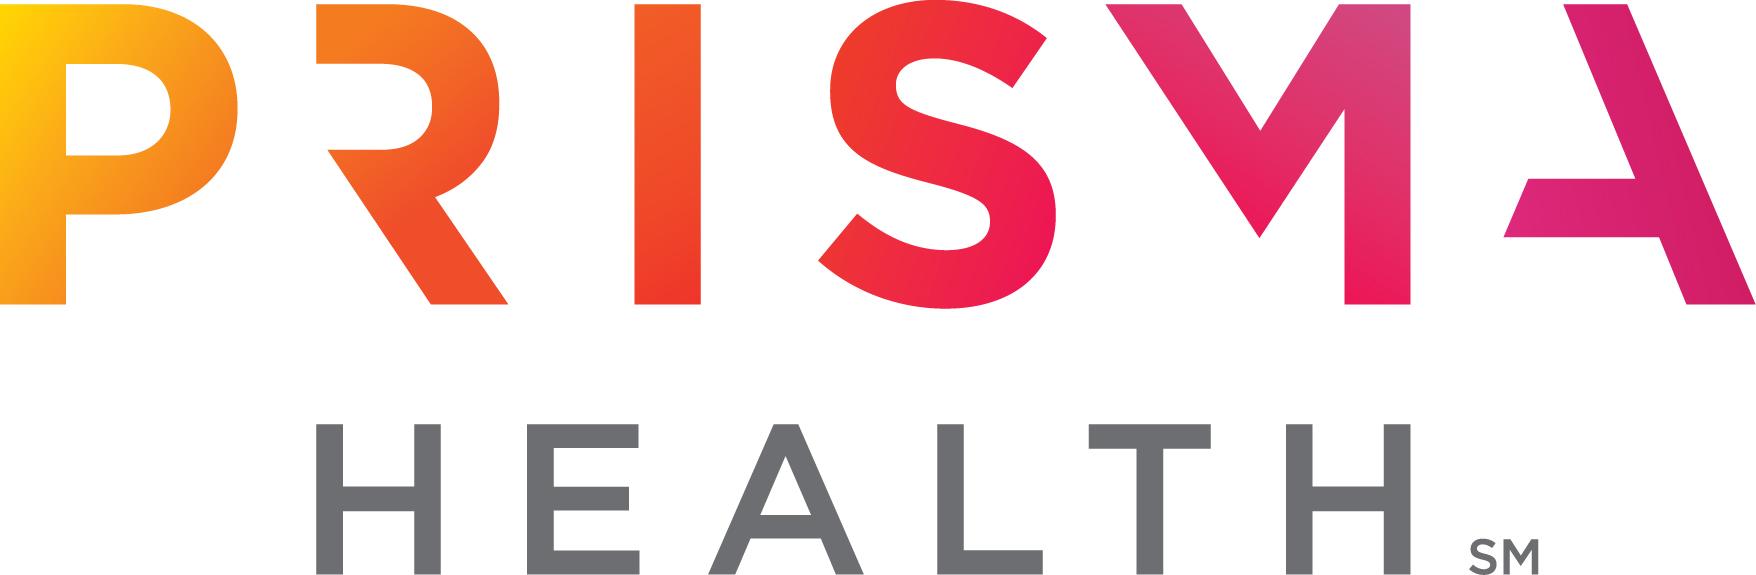 prisma health logo